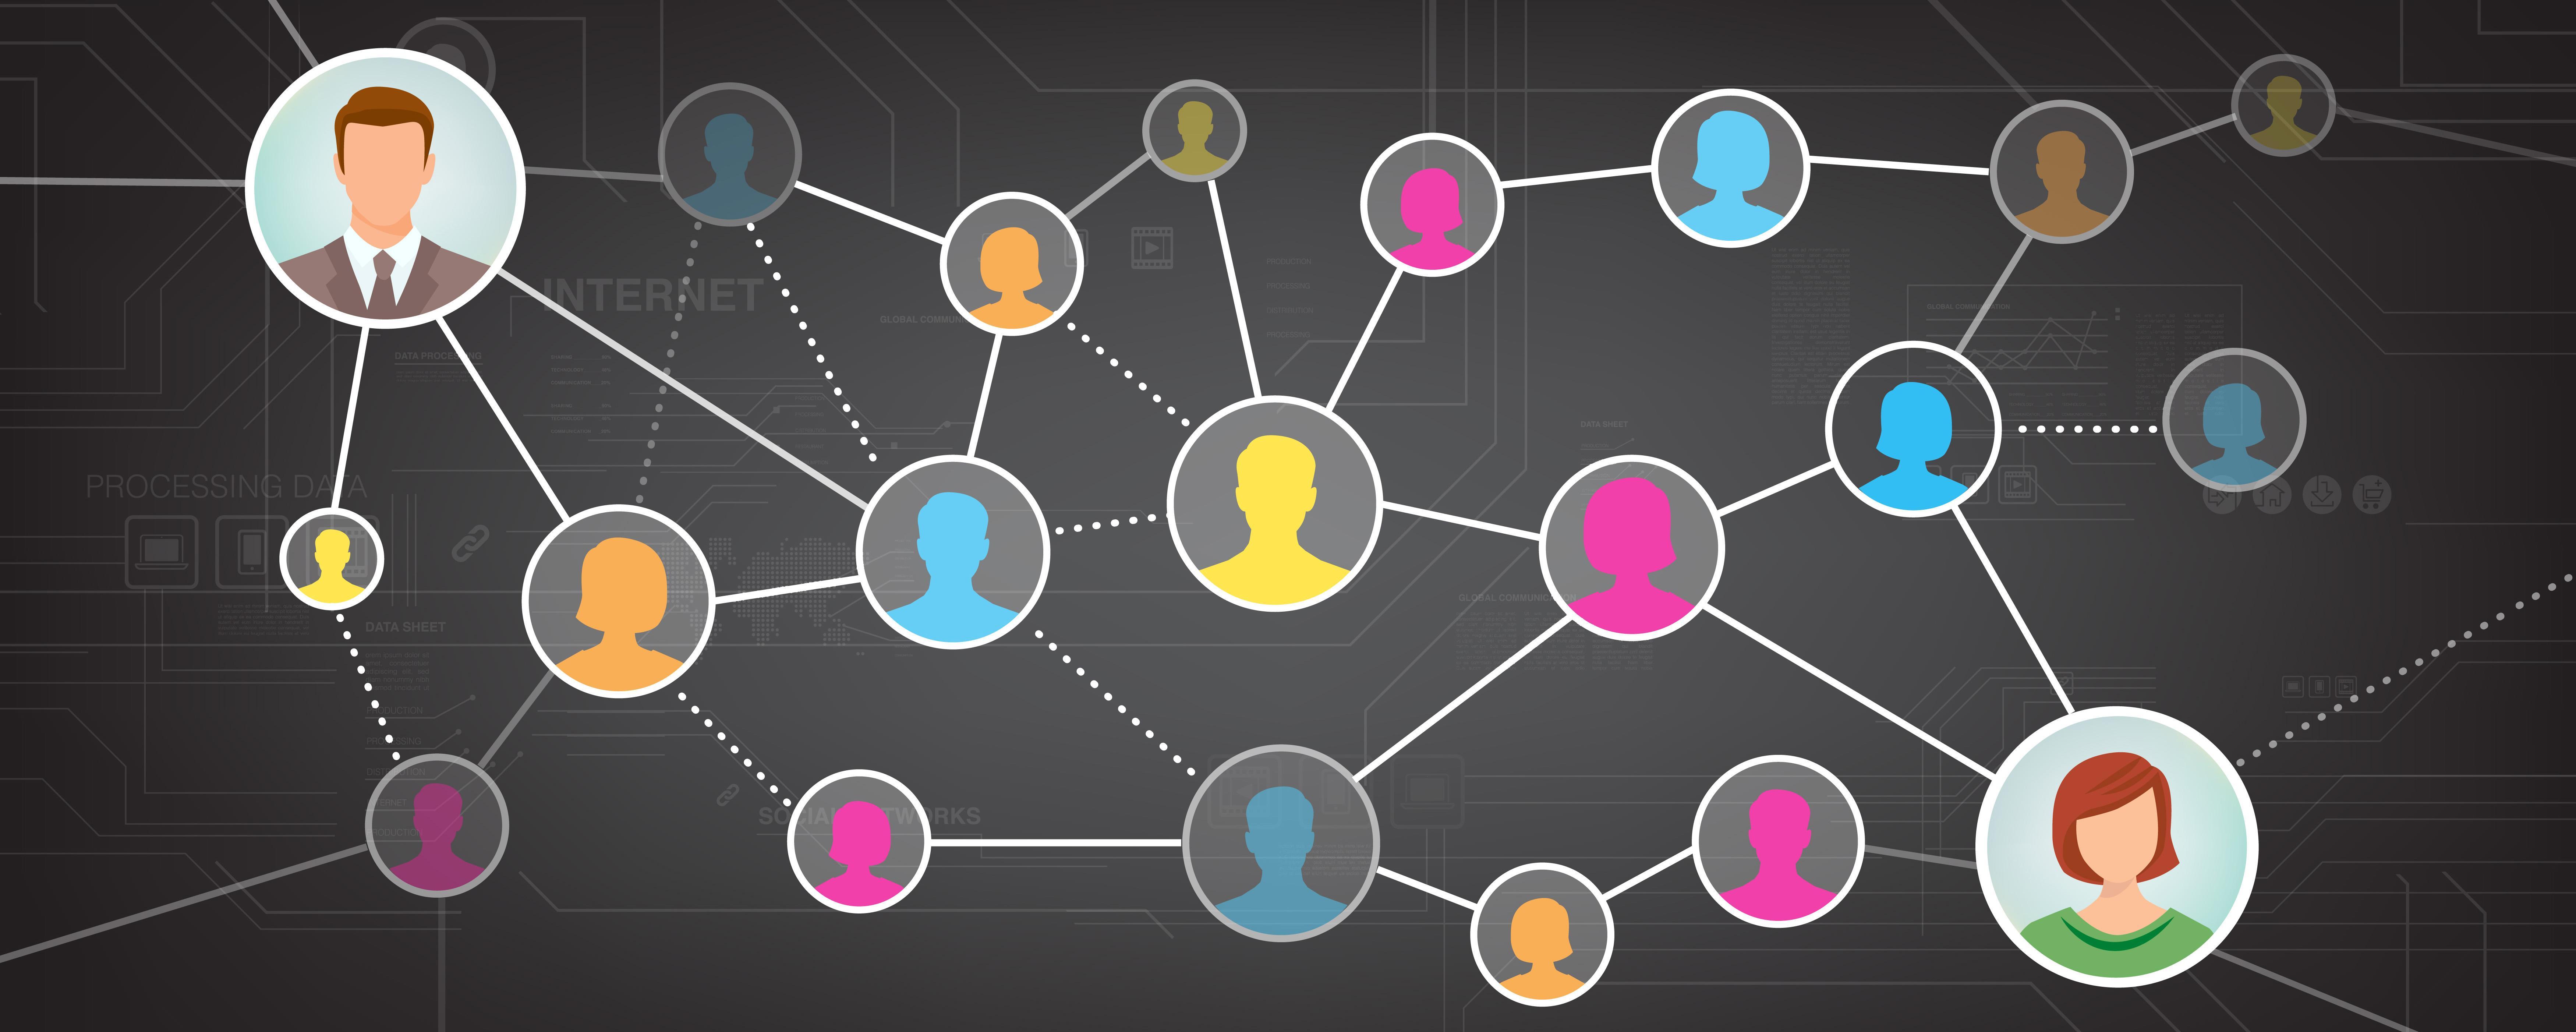 Utilizing networks to find employment?